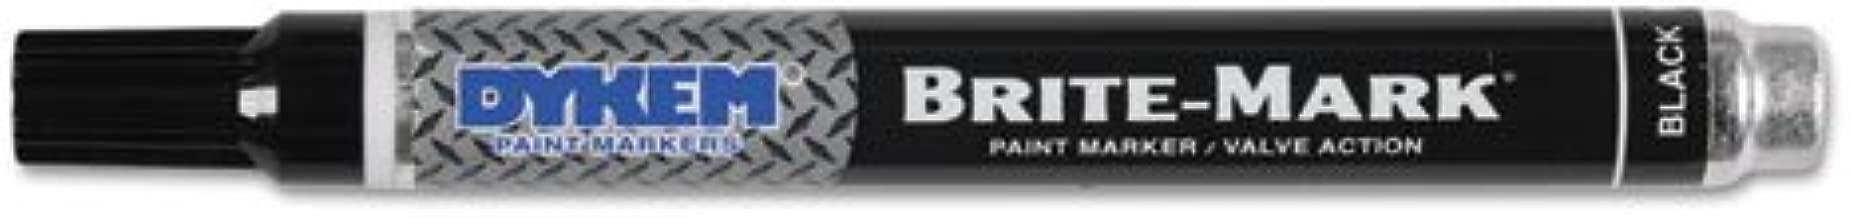 BRITE-MARK Layout Marking Pen, Medium Point, Black, Sold as 12 Each